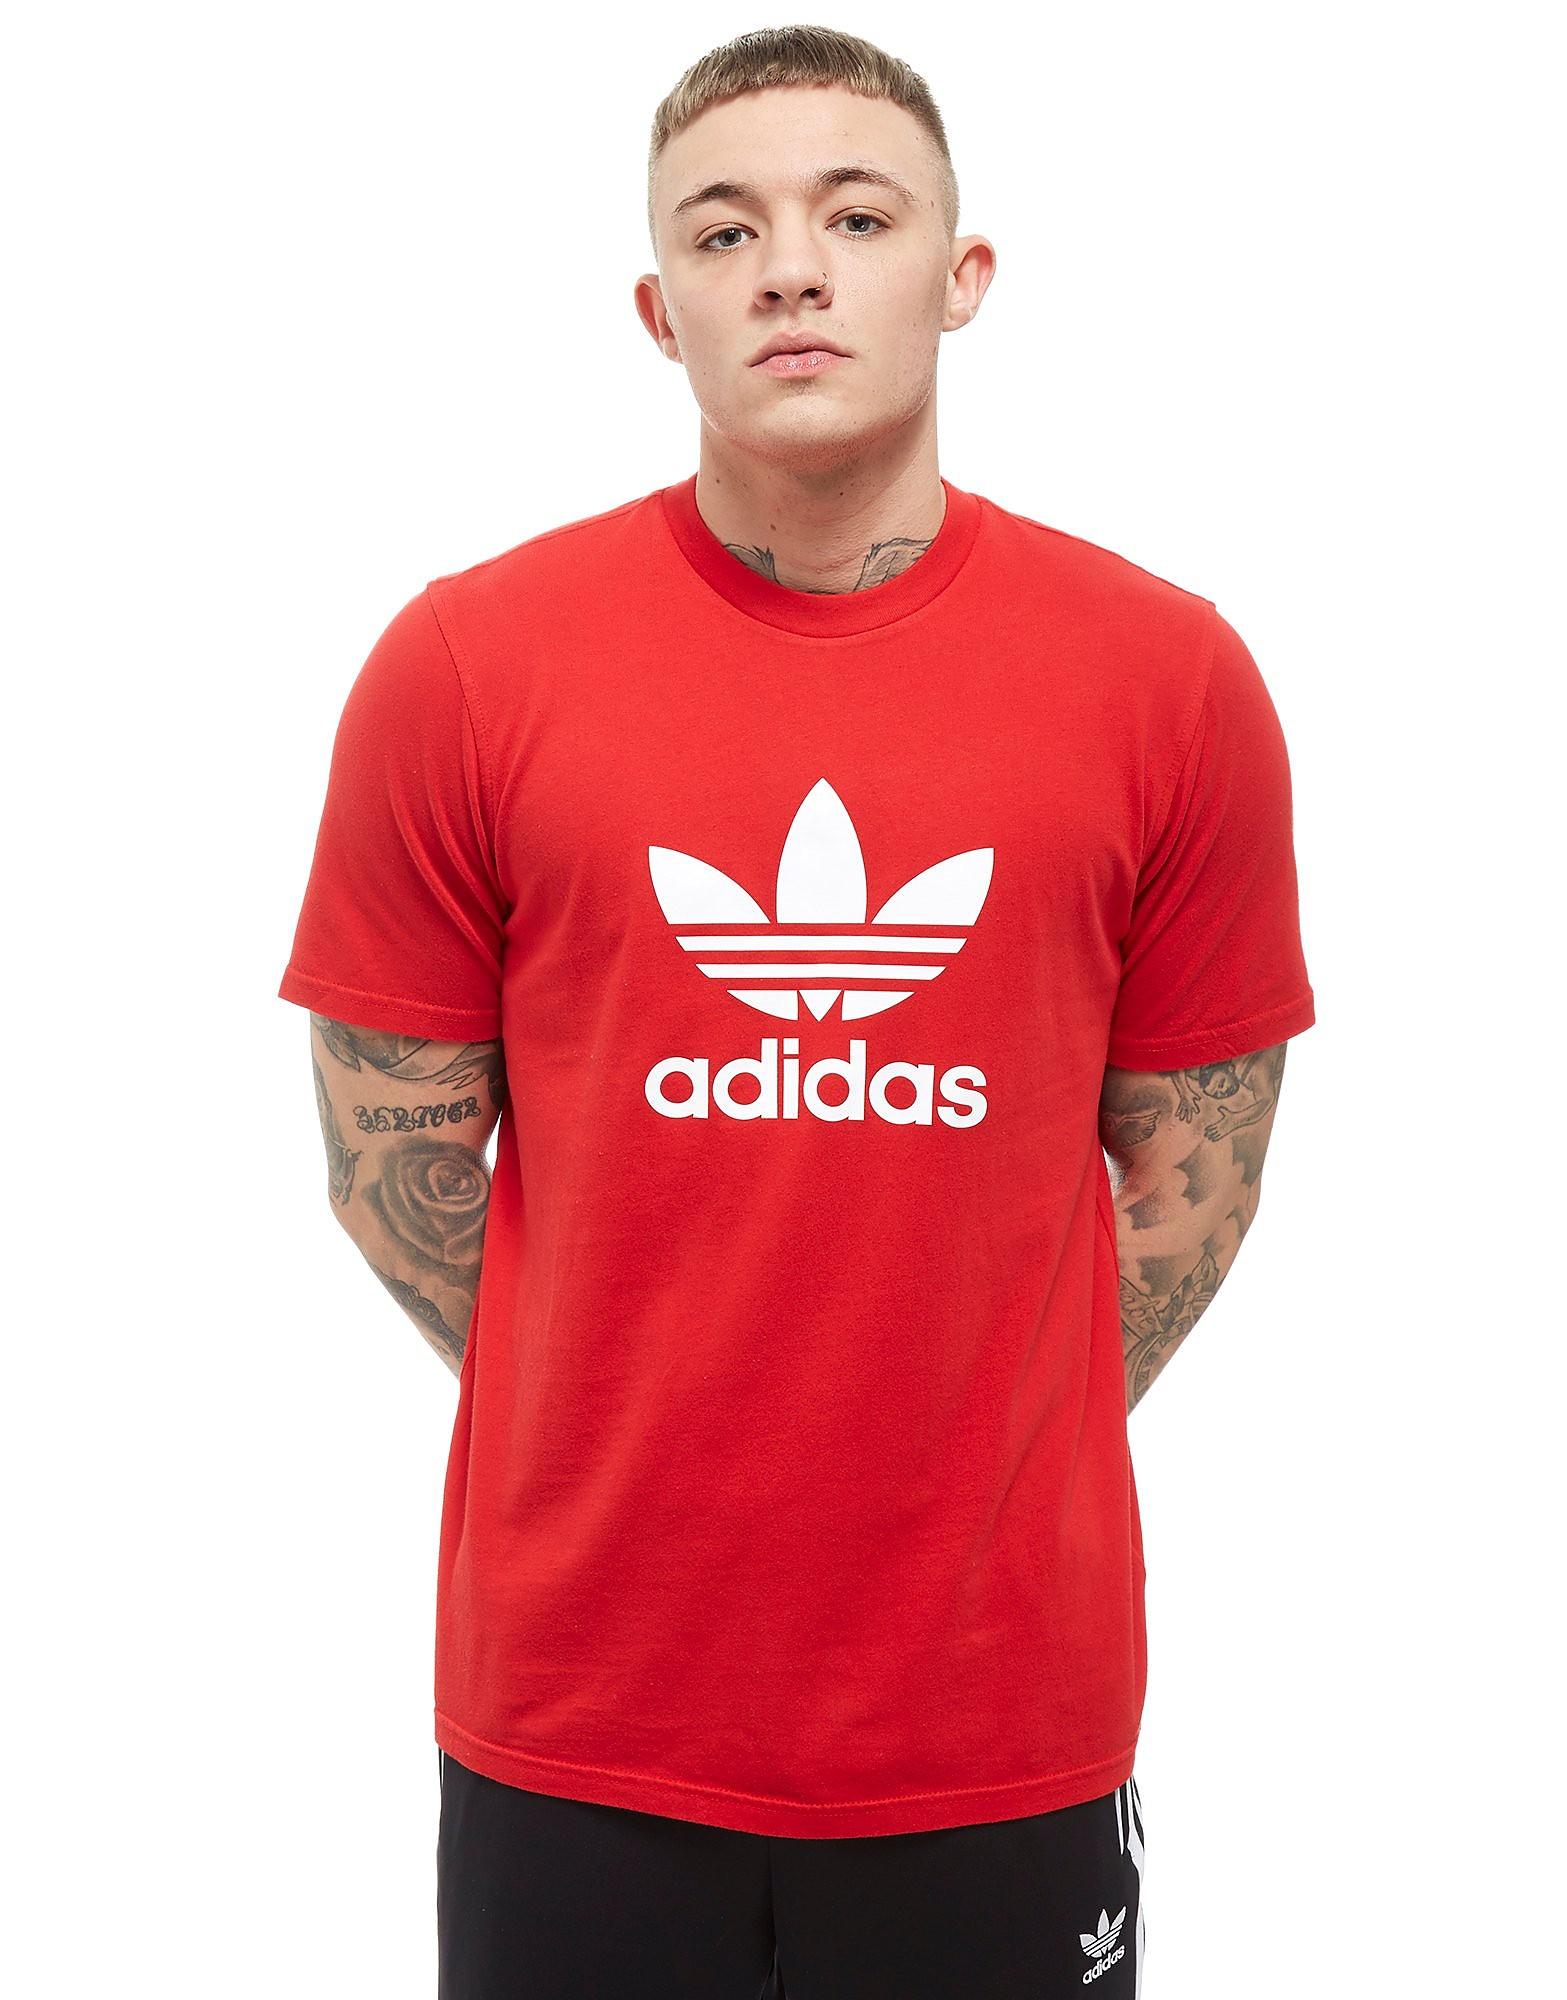 adidas Originals Trefoil State T-Shirt Homme